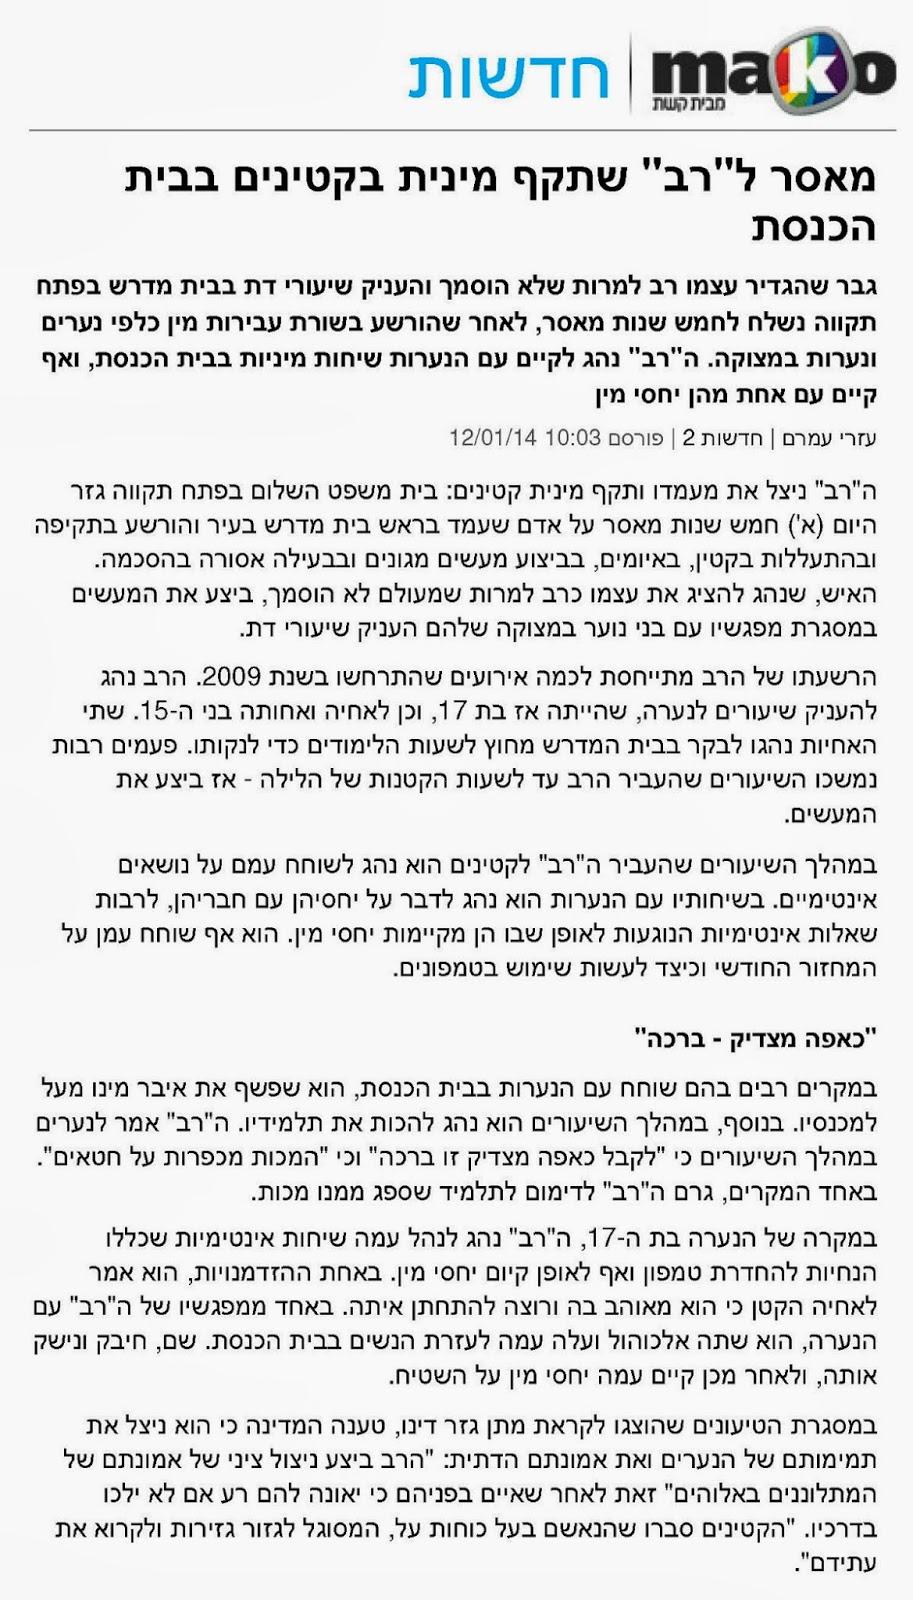 http://www.mako.co.il/news-law/legal/Article-cb15ec41e458341004.htm?Partner=rss&utm_source=mivzakimnet&utm_medium=xhtml&utm_campaign=mivzakimnet